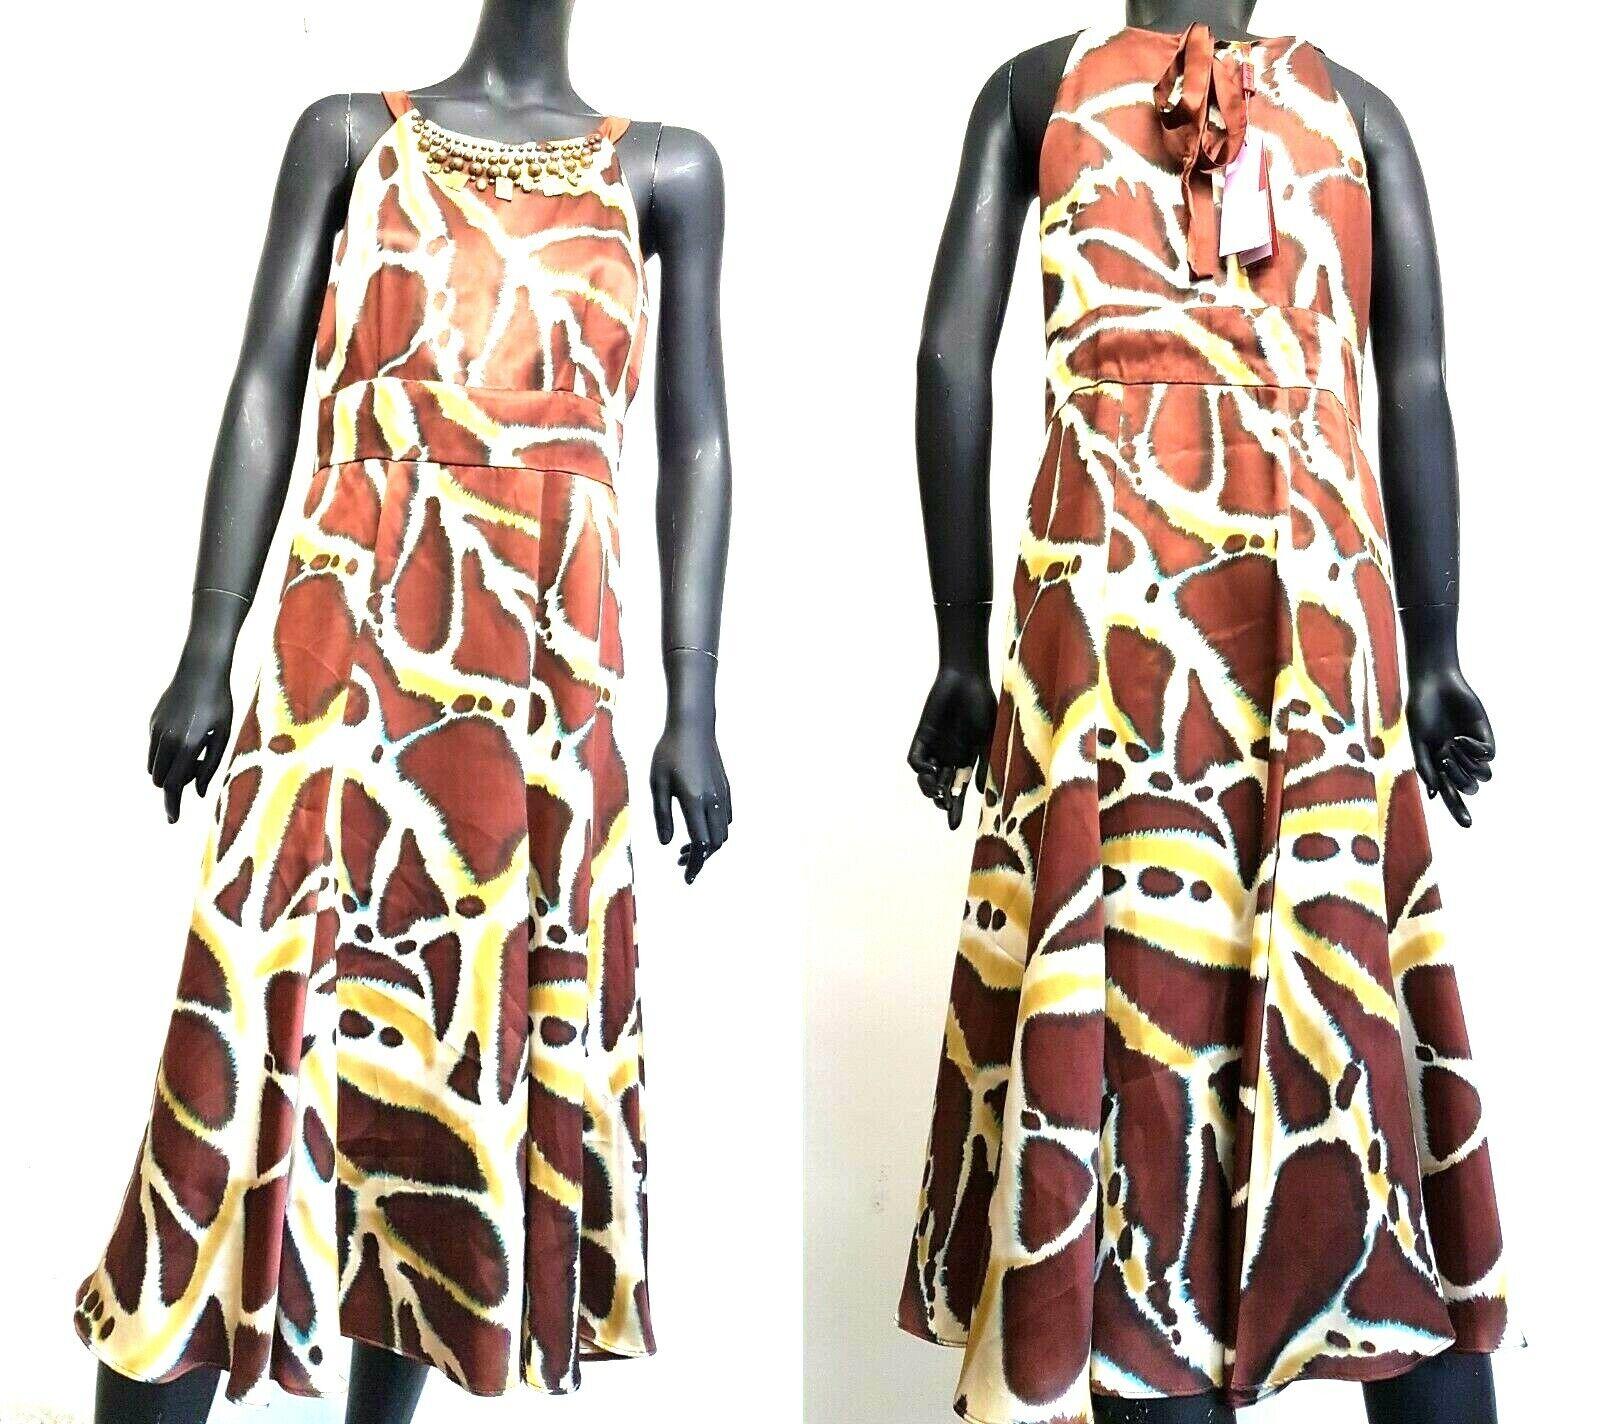 Monsoon Womens Midi Dress Brown Beige Animal Print Sleeveless Silk RRP